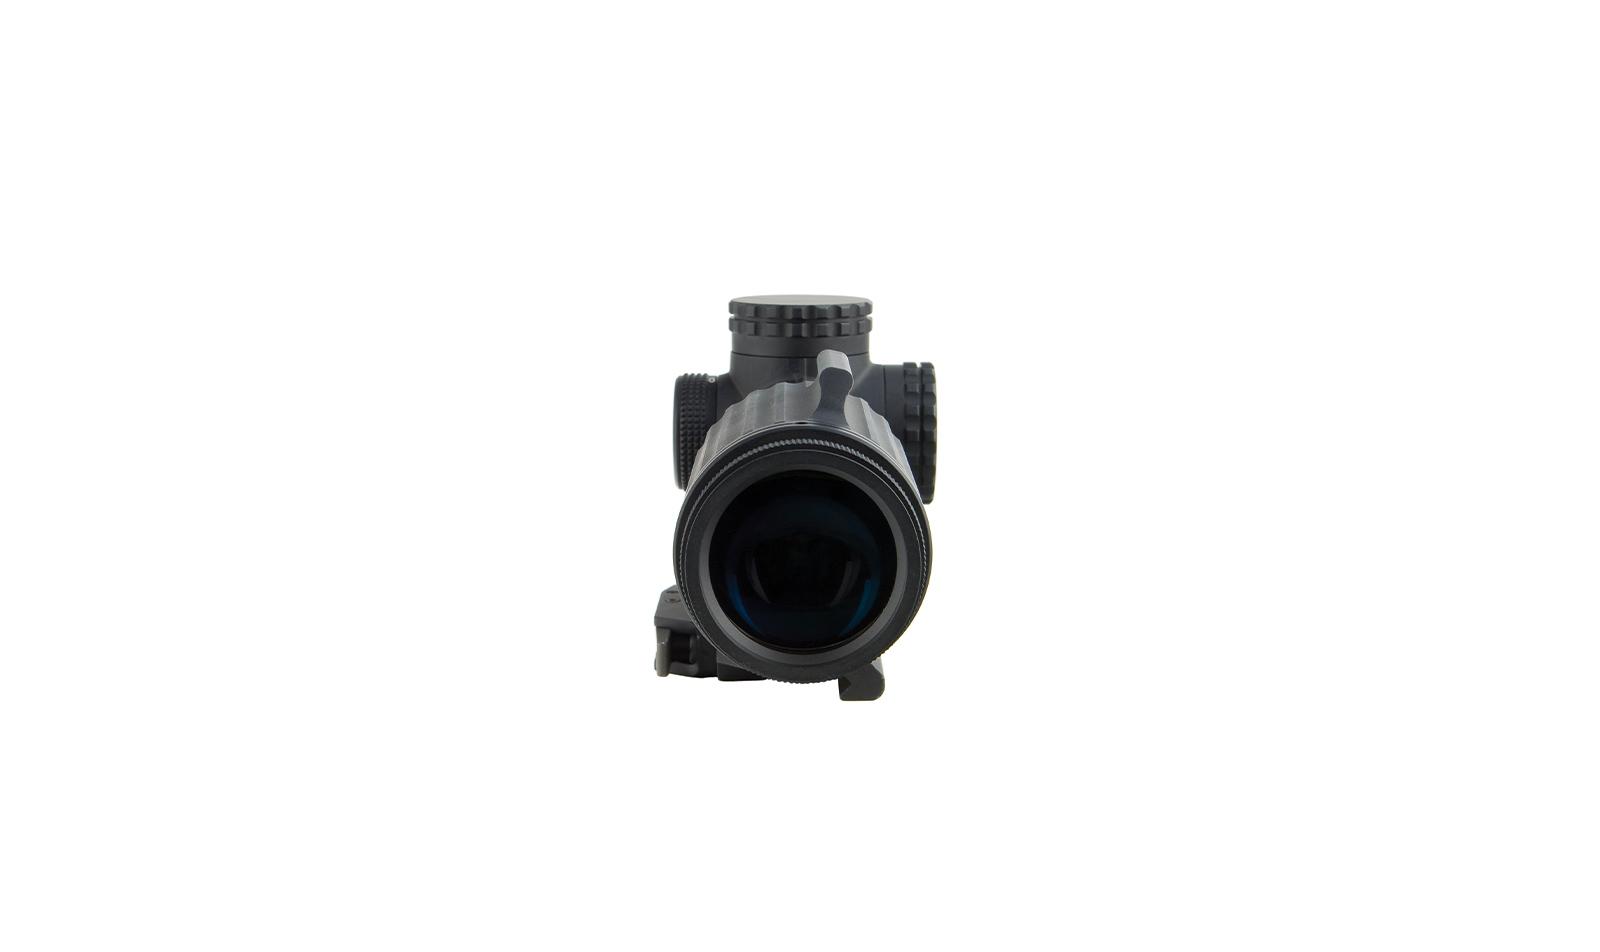 VC16-C-1600010 angle 4